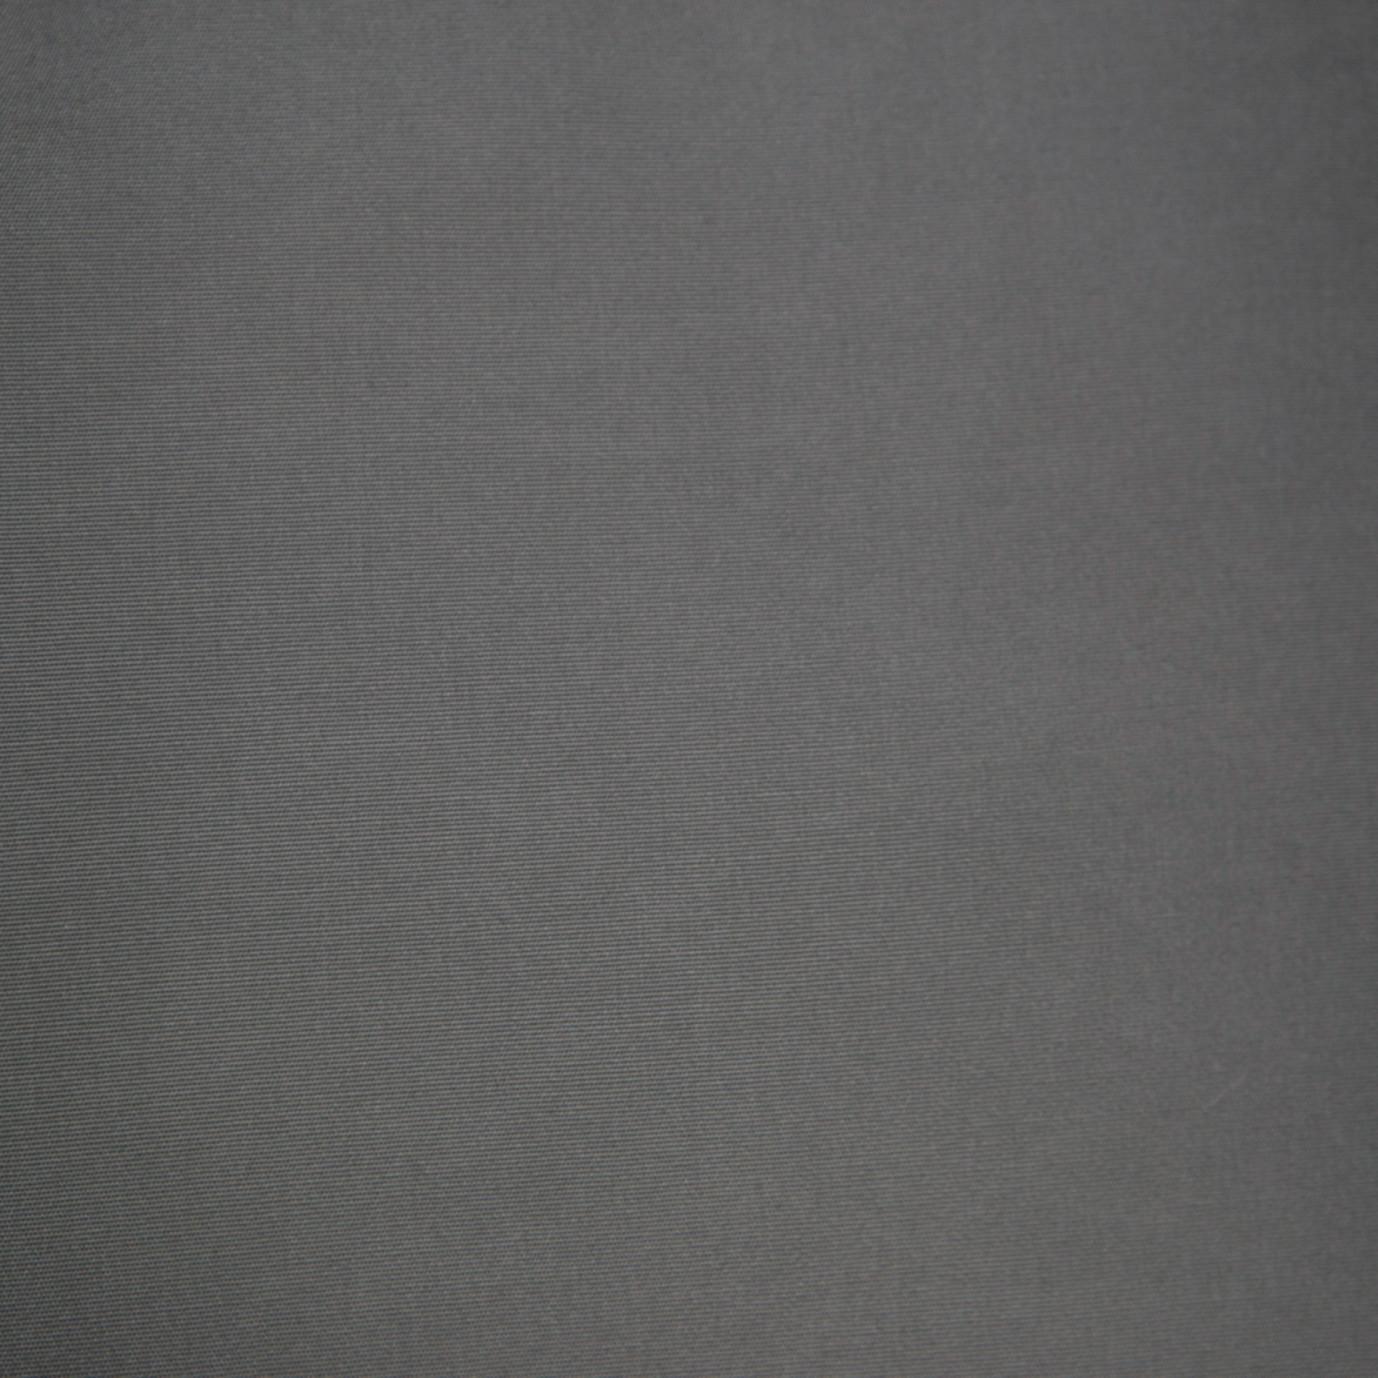 Barcelo™ Club Ottomans - Charcoal Gray